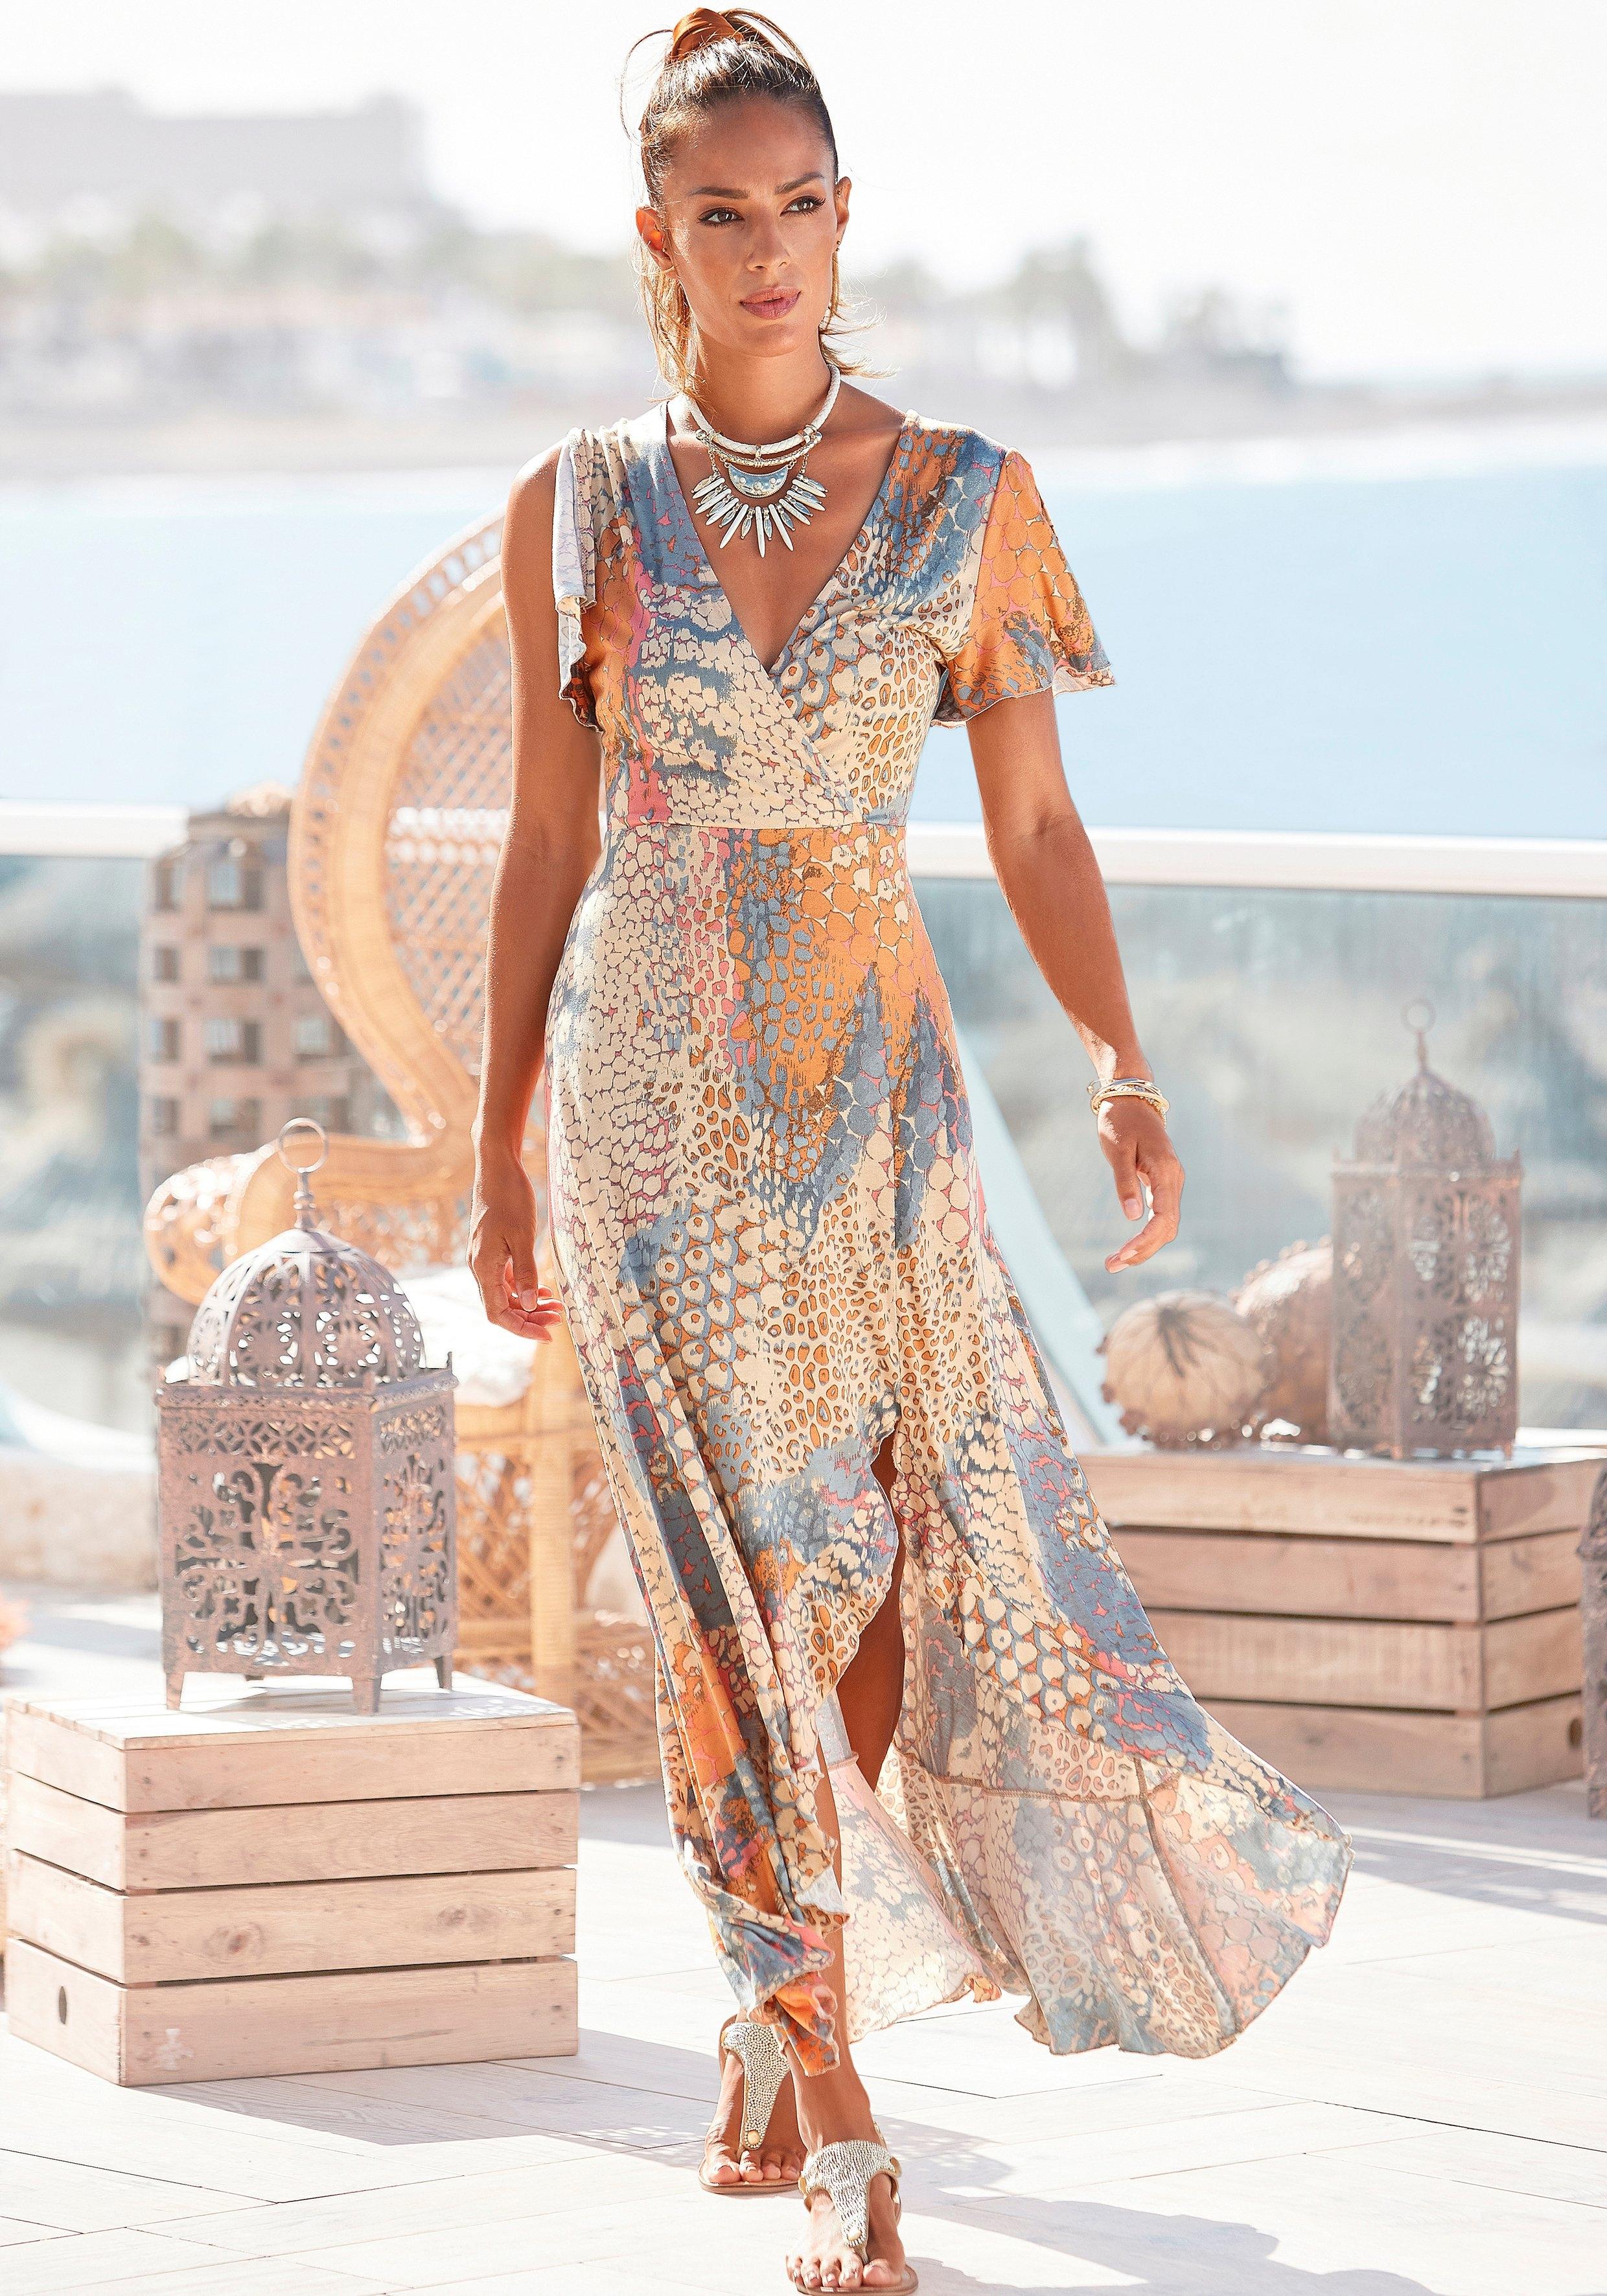 Buffalo Maxi-jurk met dierenprint nu online kopen bij Lascana